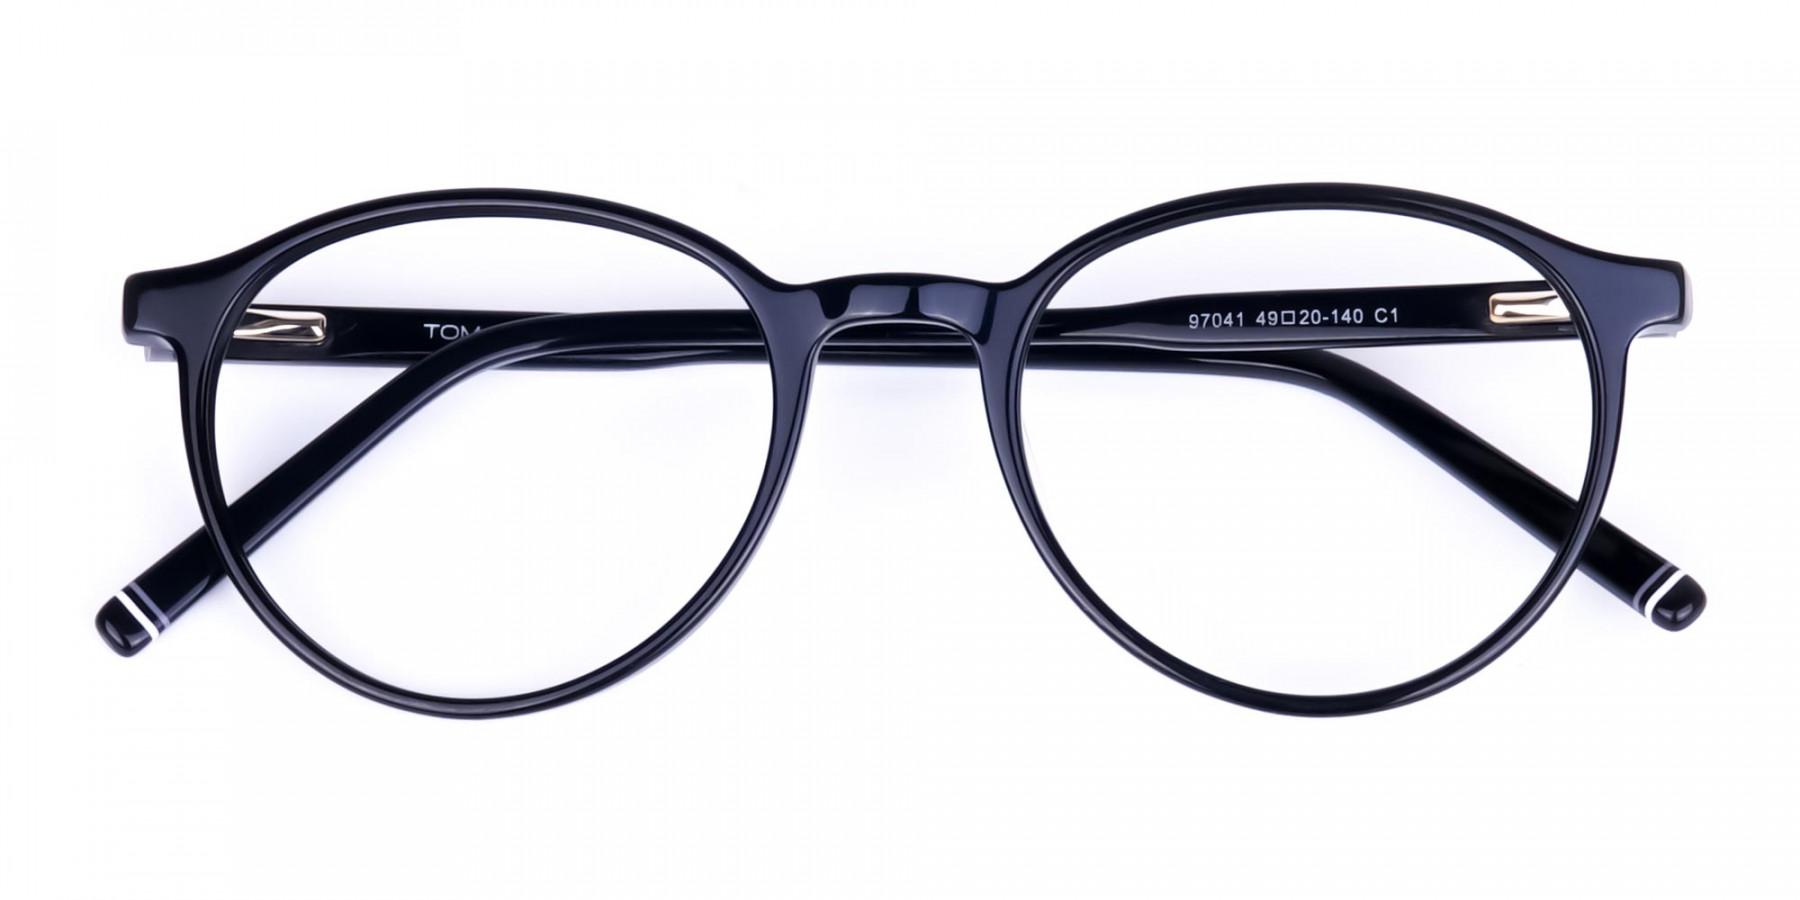 Classic-Black-Rimmed-Round-Glasses-1